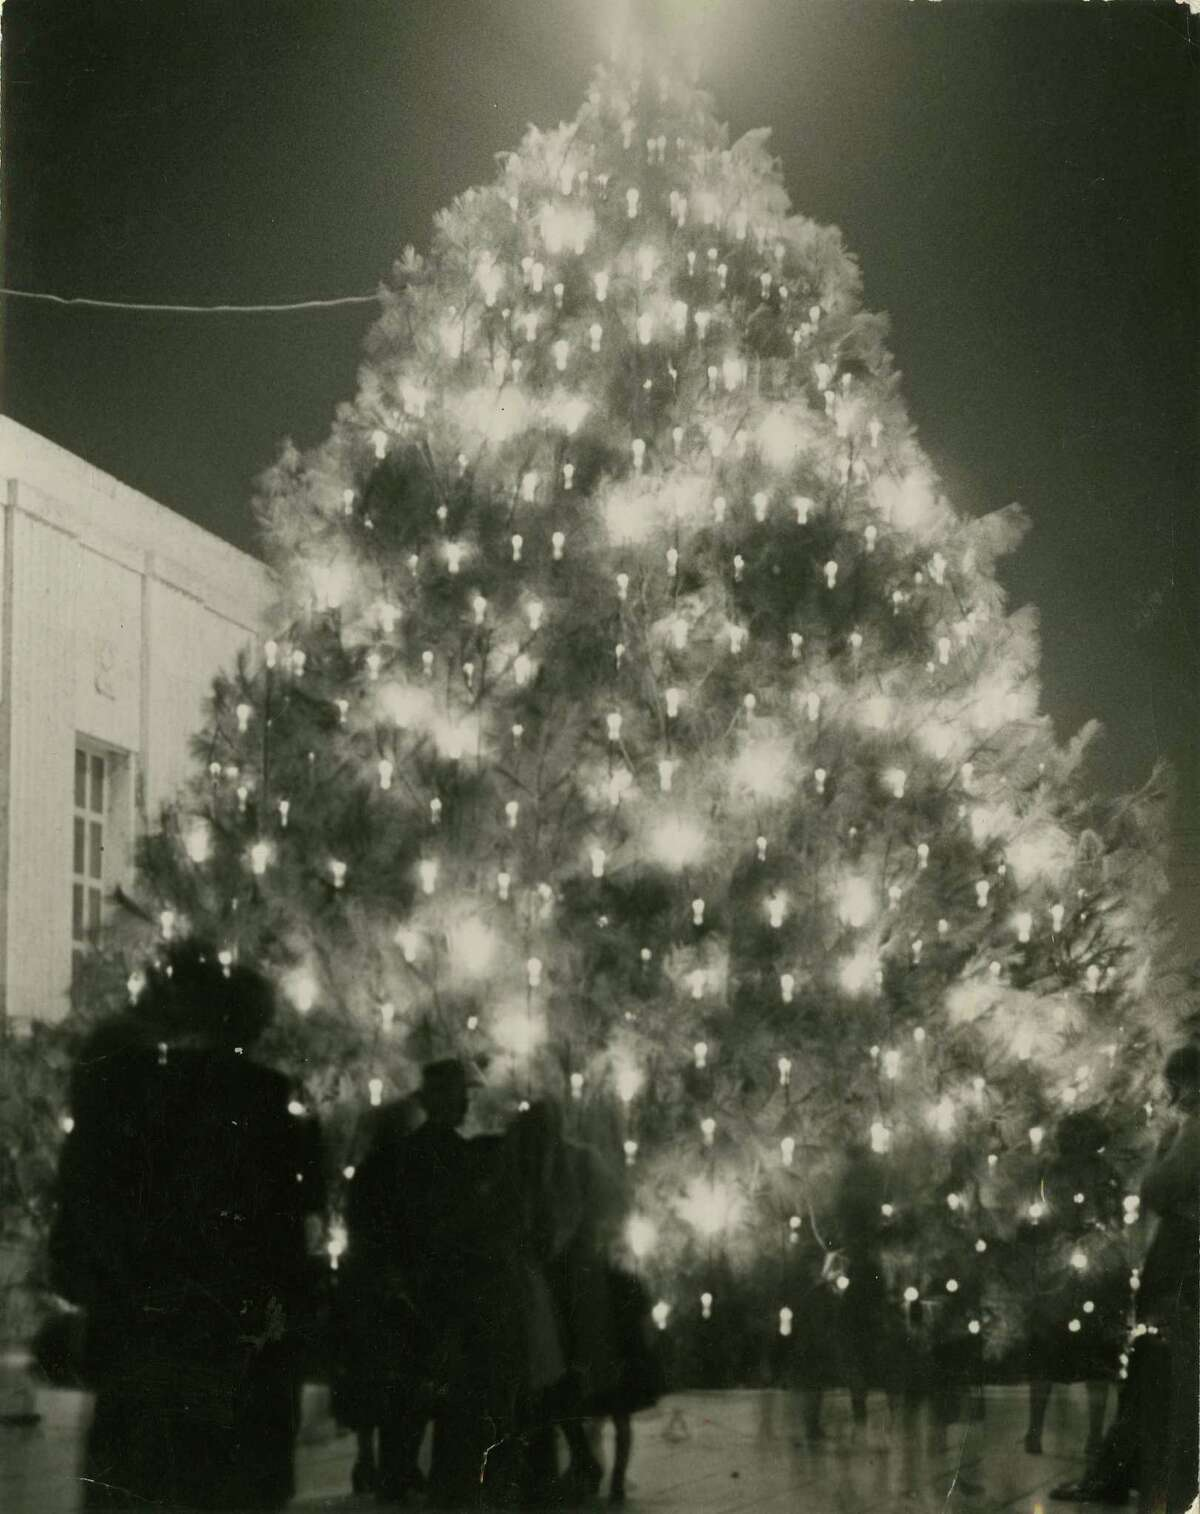 December 15, 1950: The Tree of Light outside Houston's City Hall.